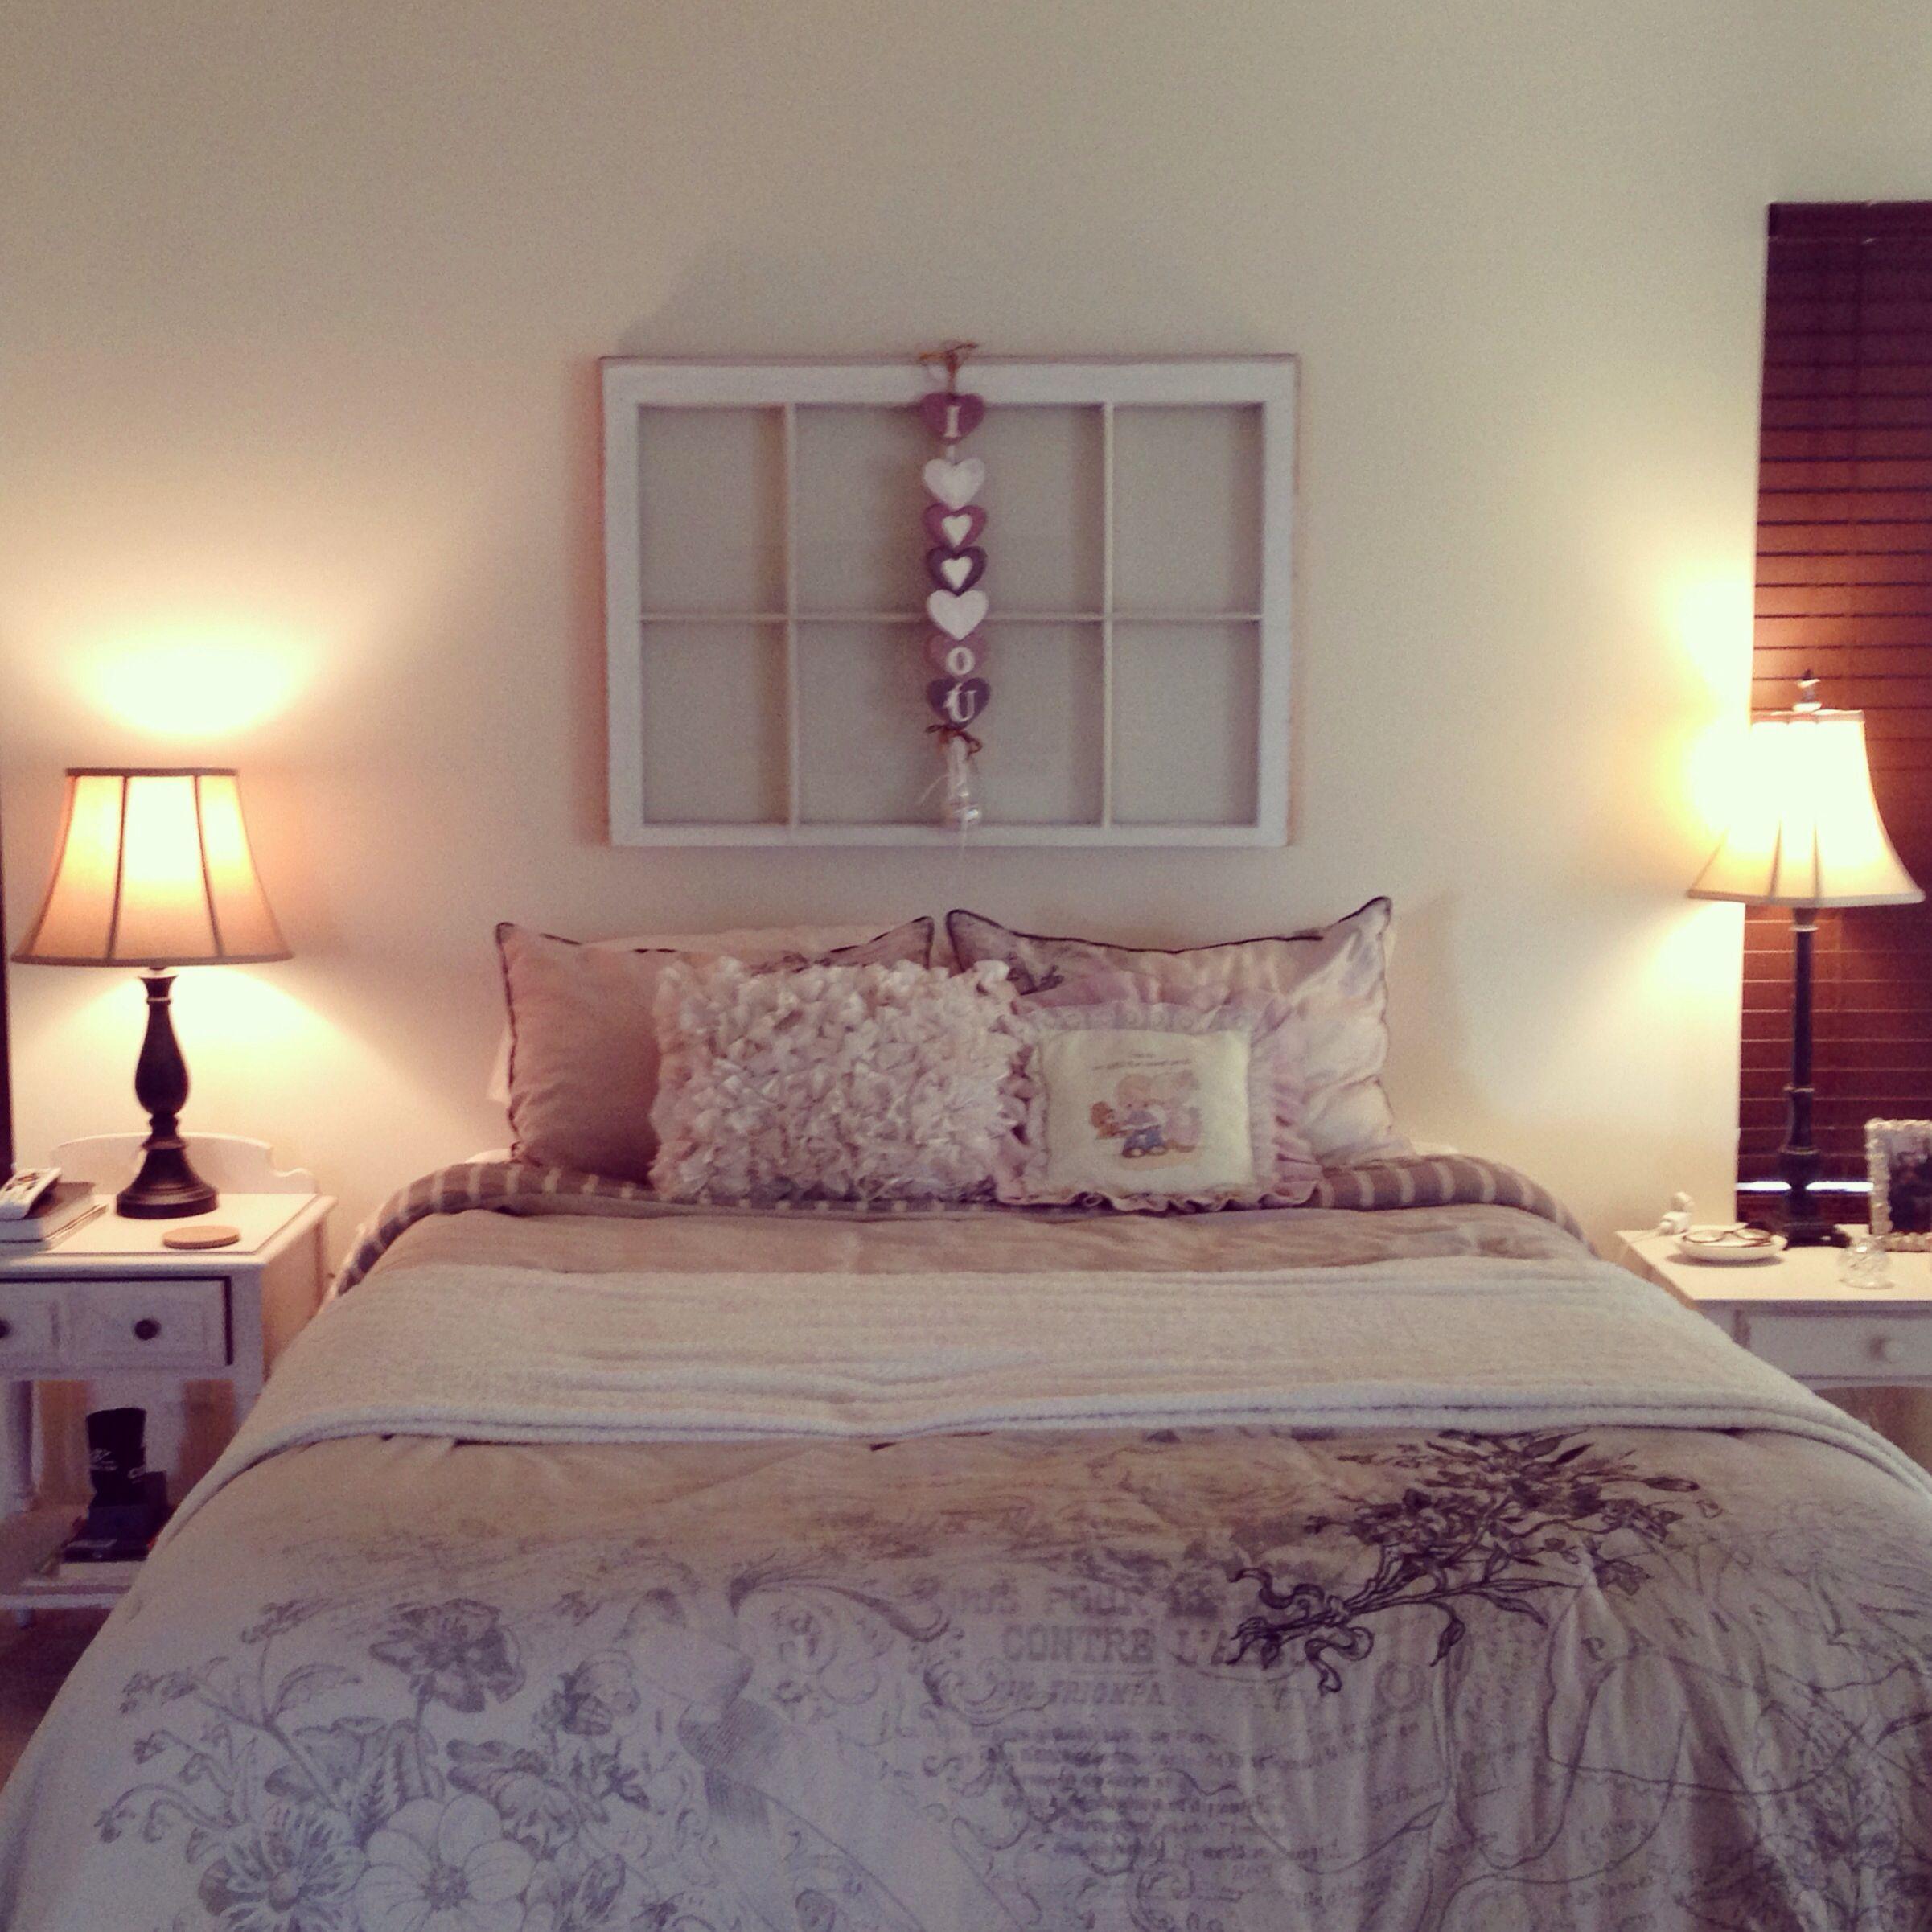 Shabby Chic Bedroom Design Idea: Shabby Chic Bedroom